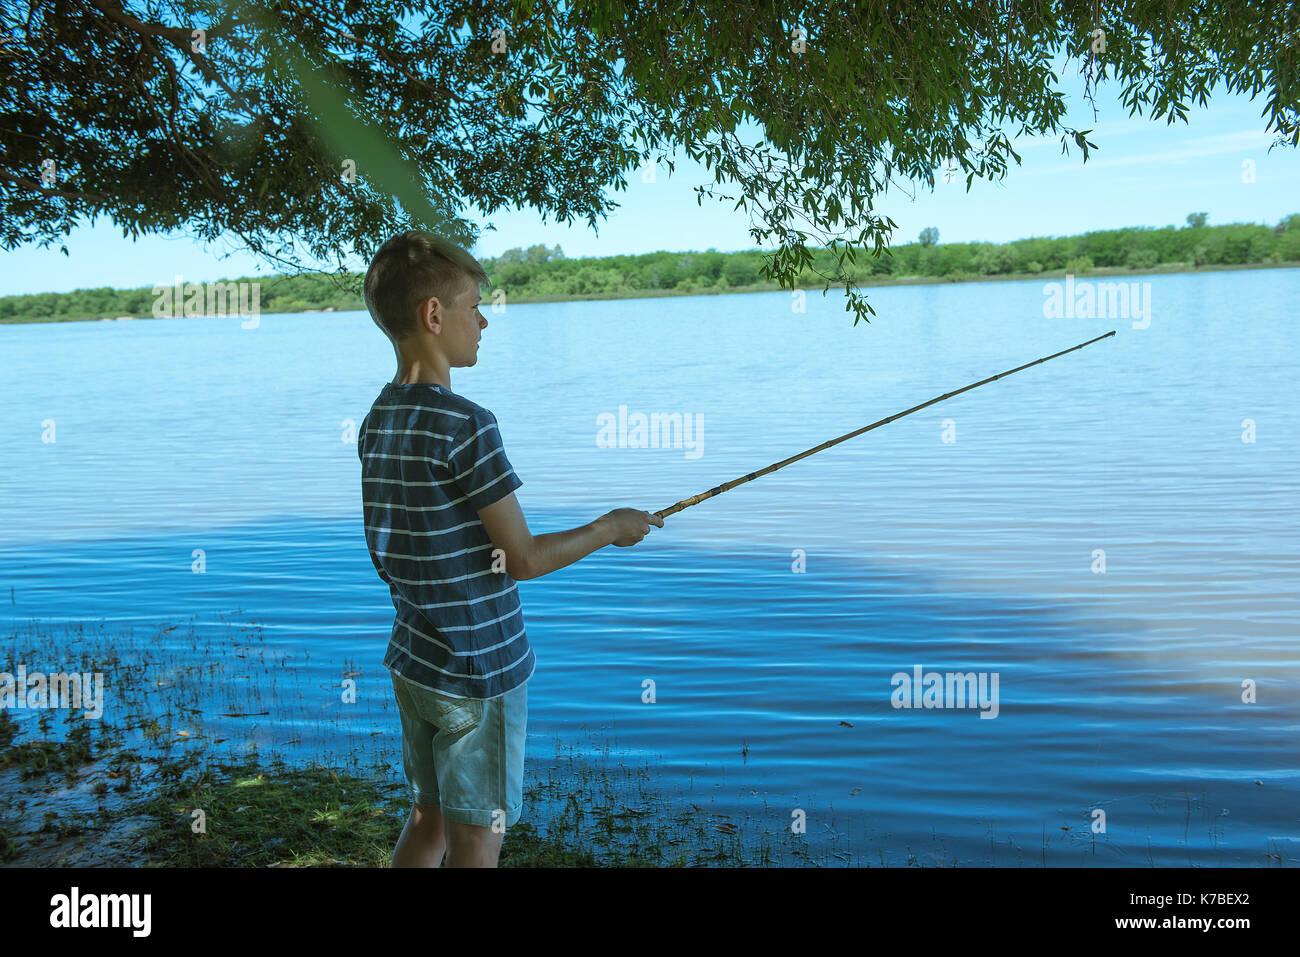 Boy fishing on lake shore - Stock Image